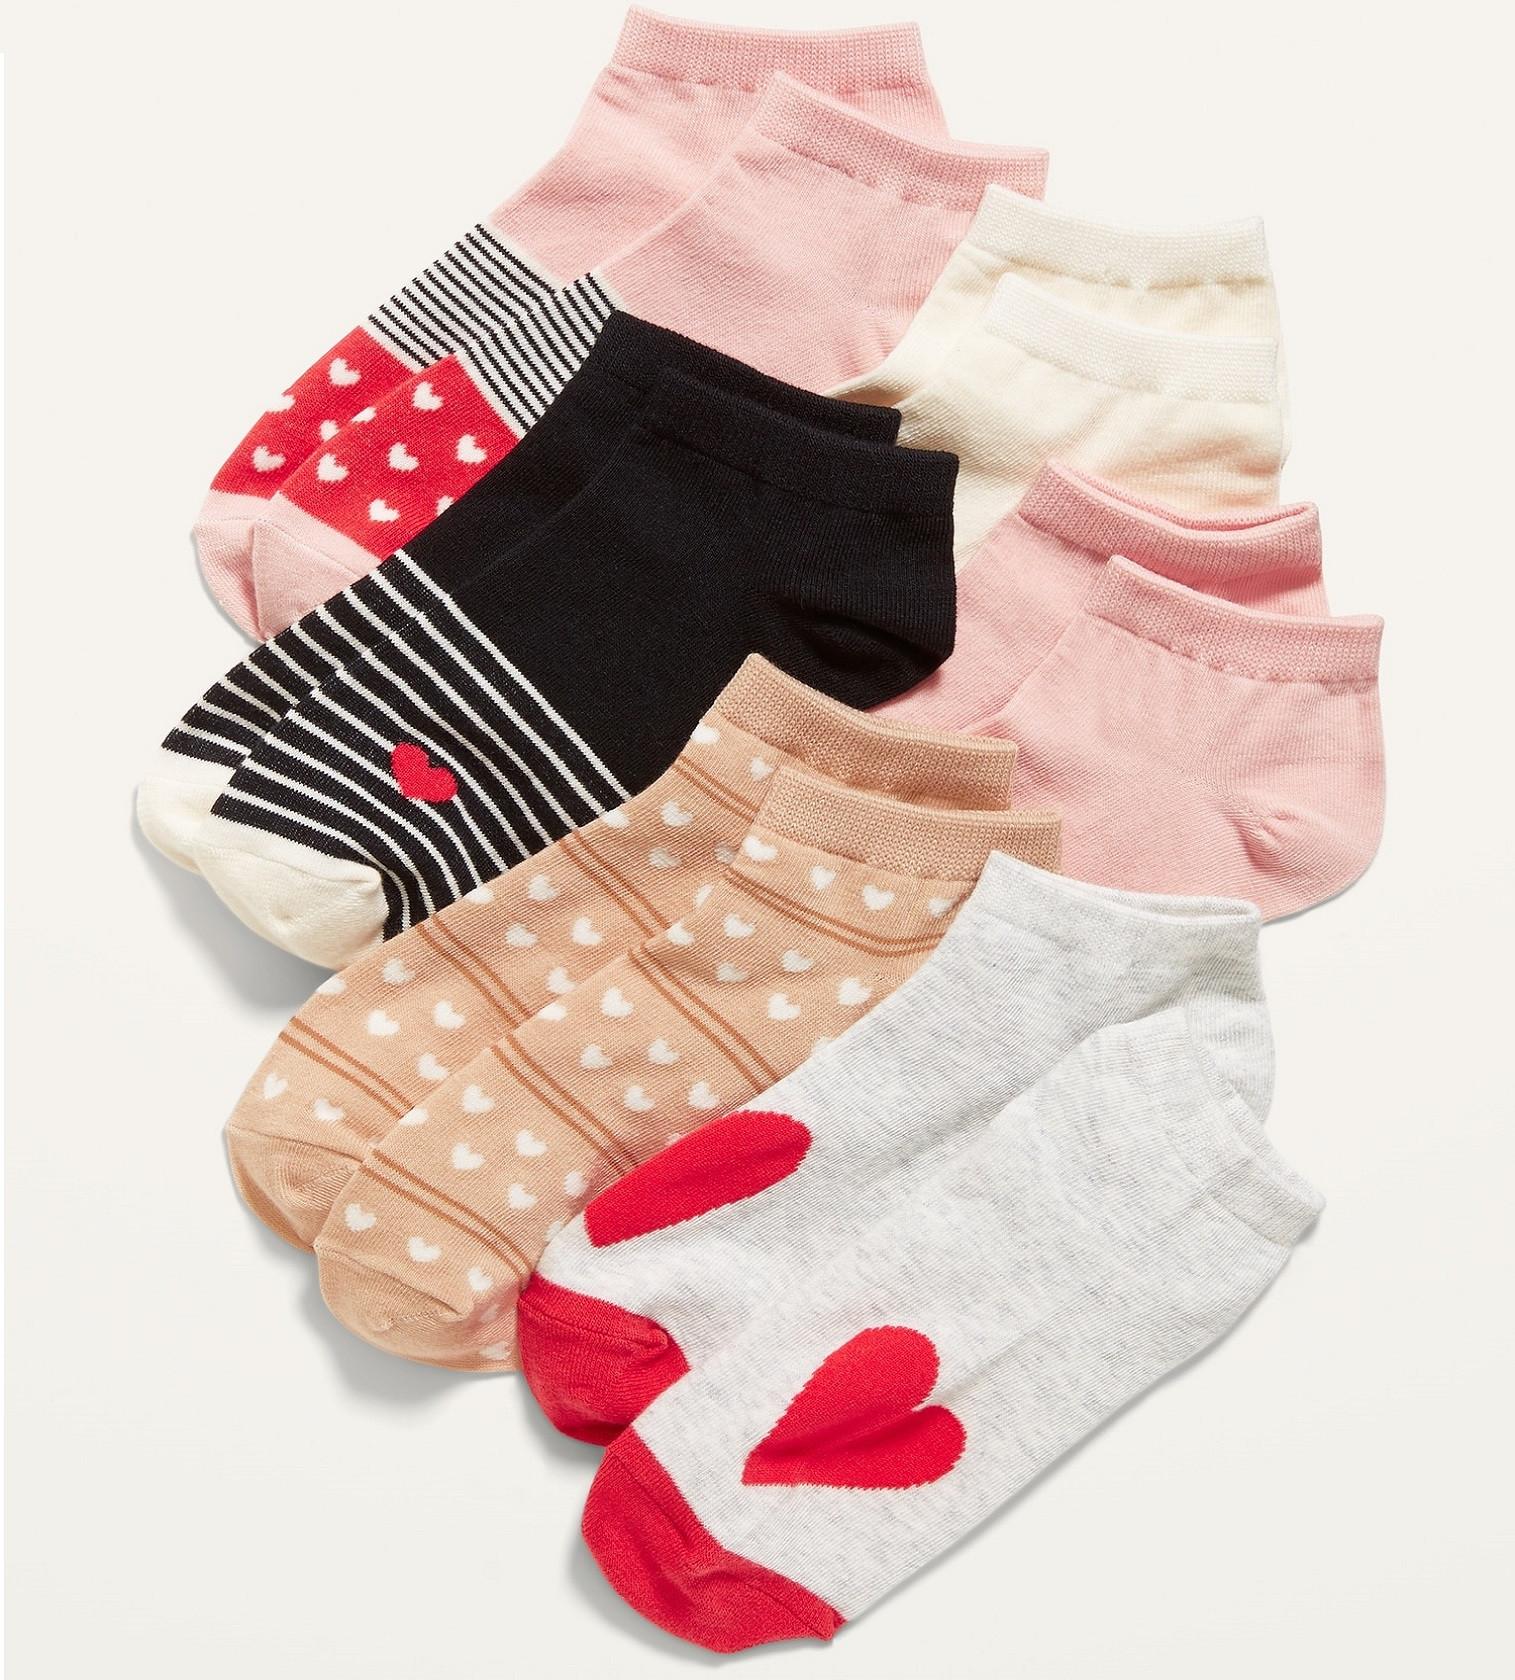 Купити Набір шкарпеток Socks 6-Pack Old Navy Heart Stripe - фото 1